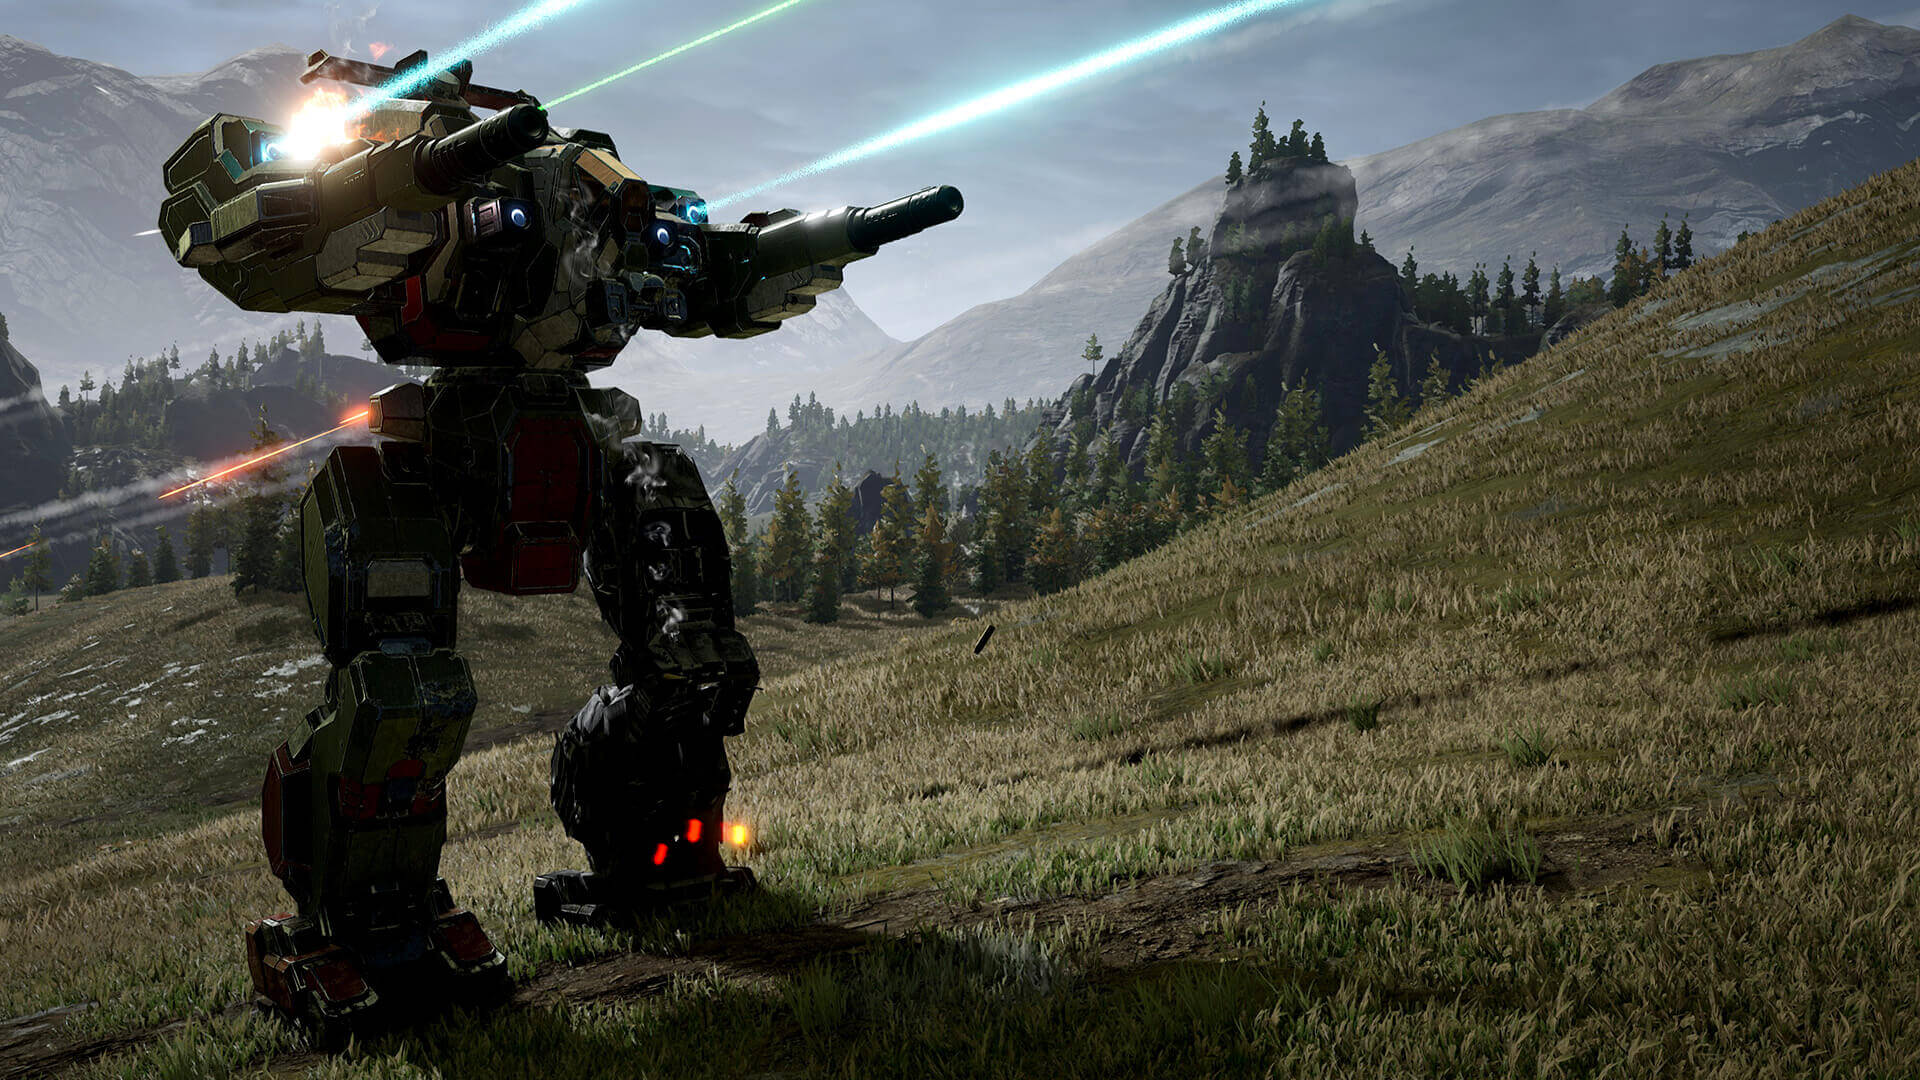 Mechwarrior 5 - Epic Games Store